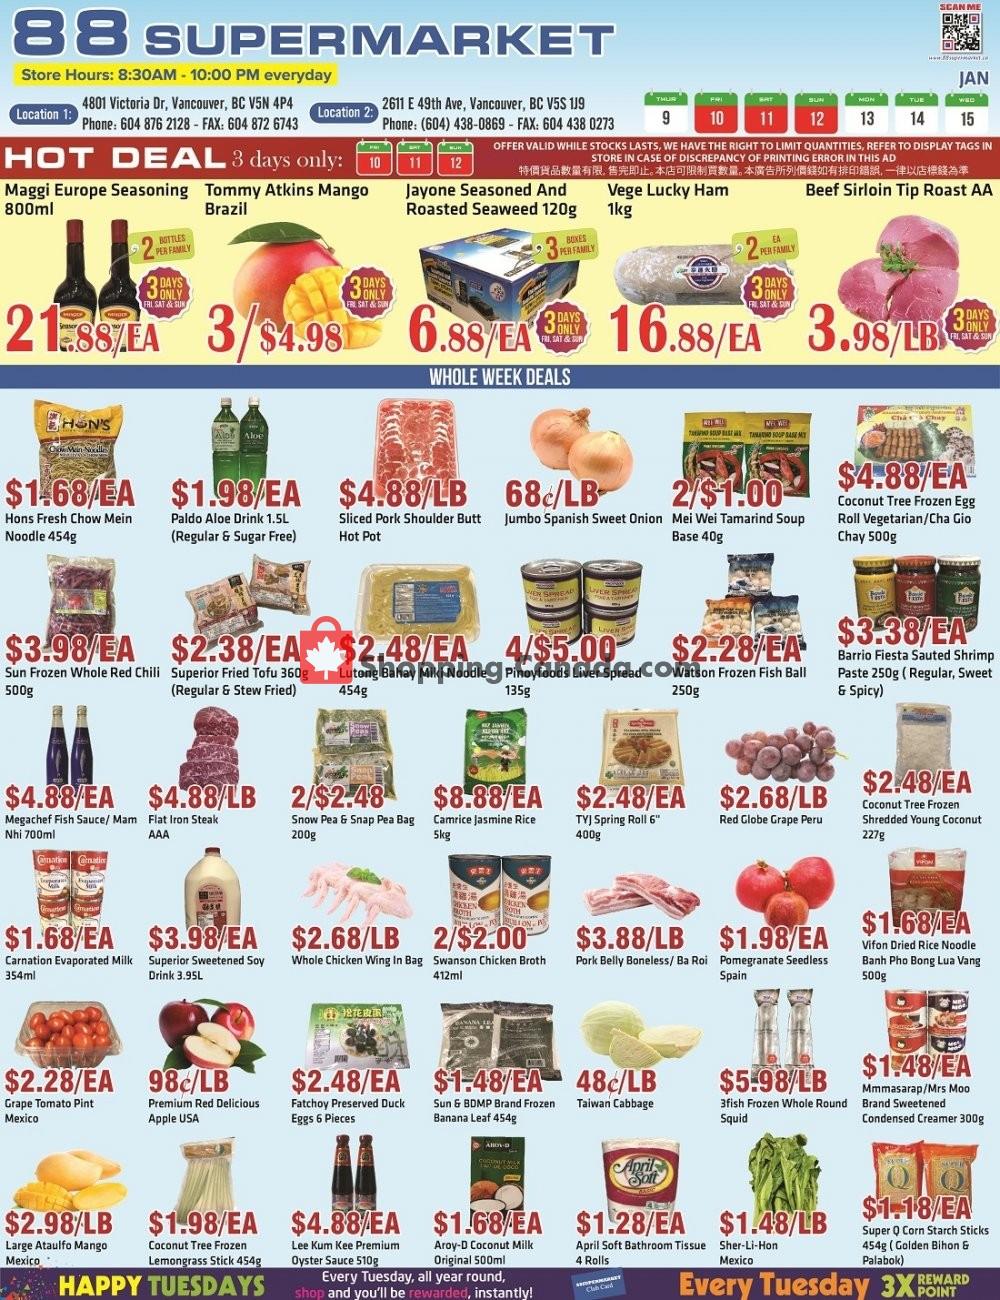 Flyer 88 Supermarket Canada - from Thursday January 9, 2020 to Wednesday January 15, 2020